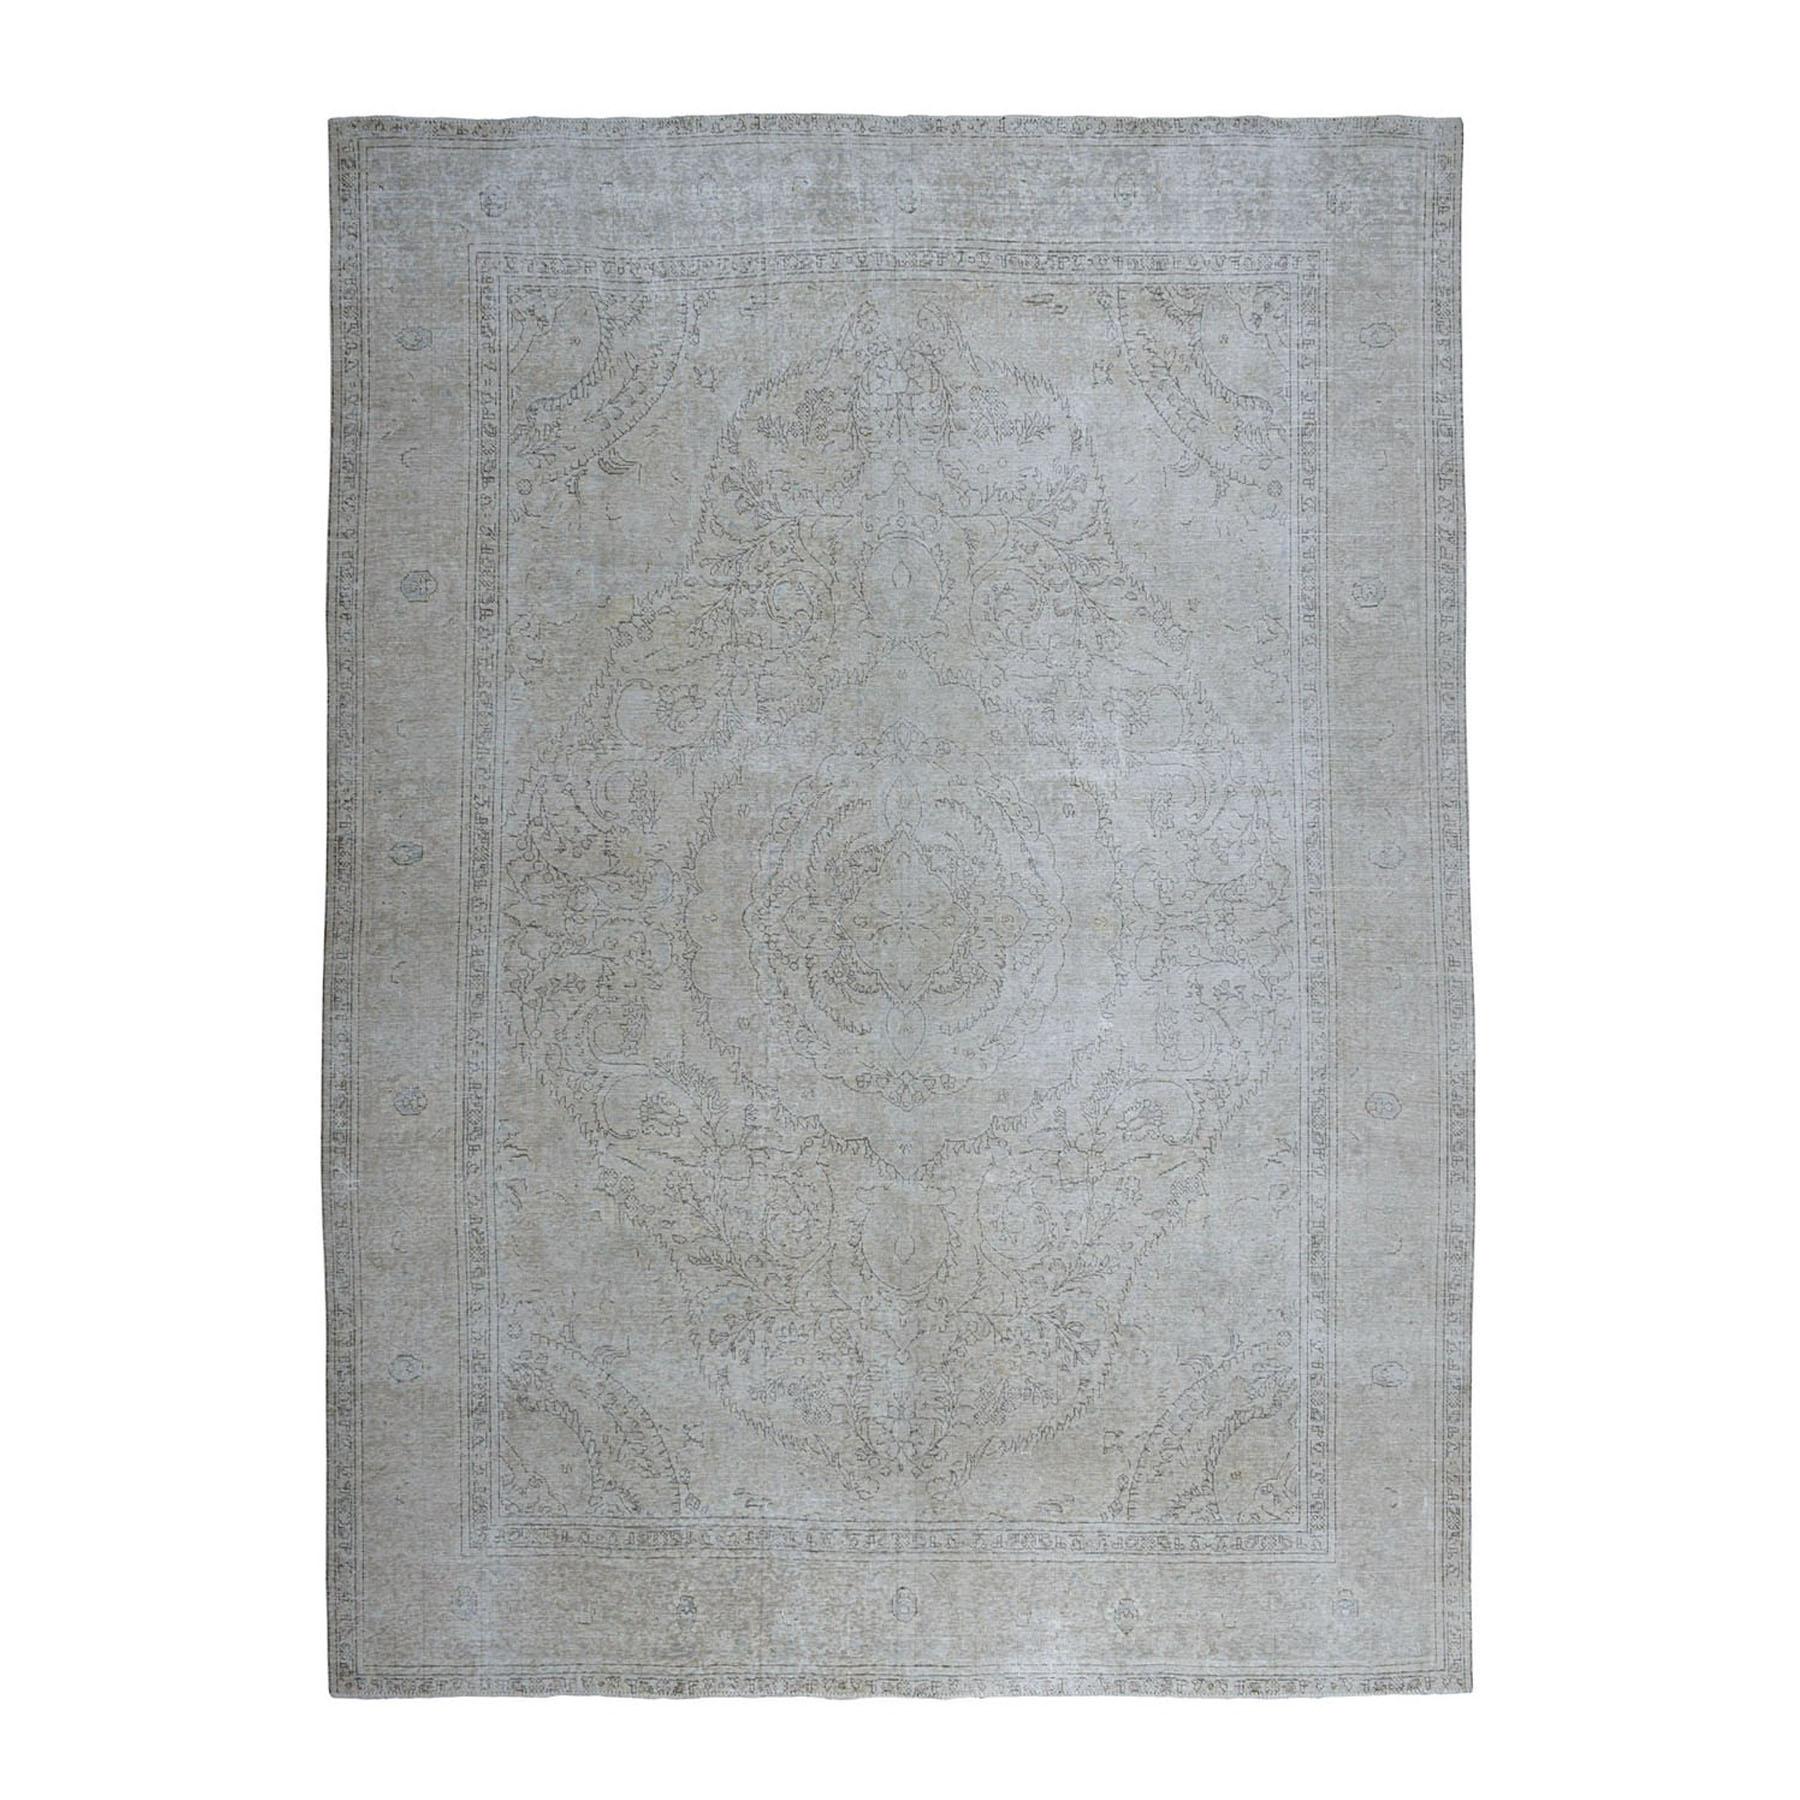 "9'10""X12'5"" Silver White Wash Vintage Tabriz Worn Wool Hand-Knotted Oriental Rug moae06a7"